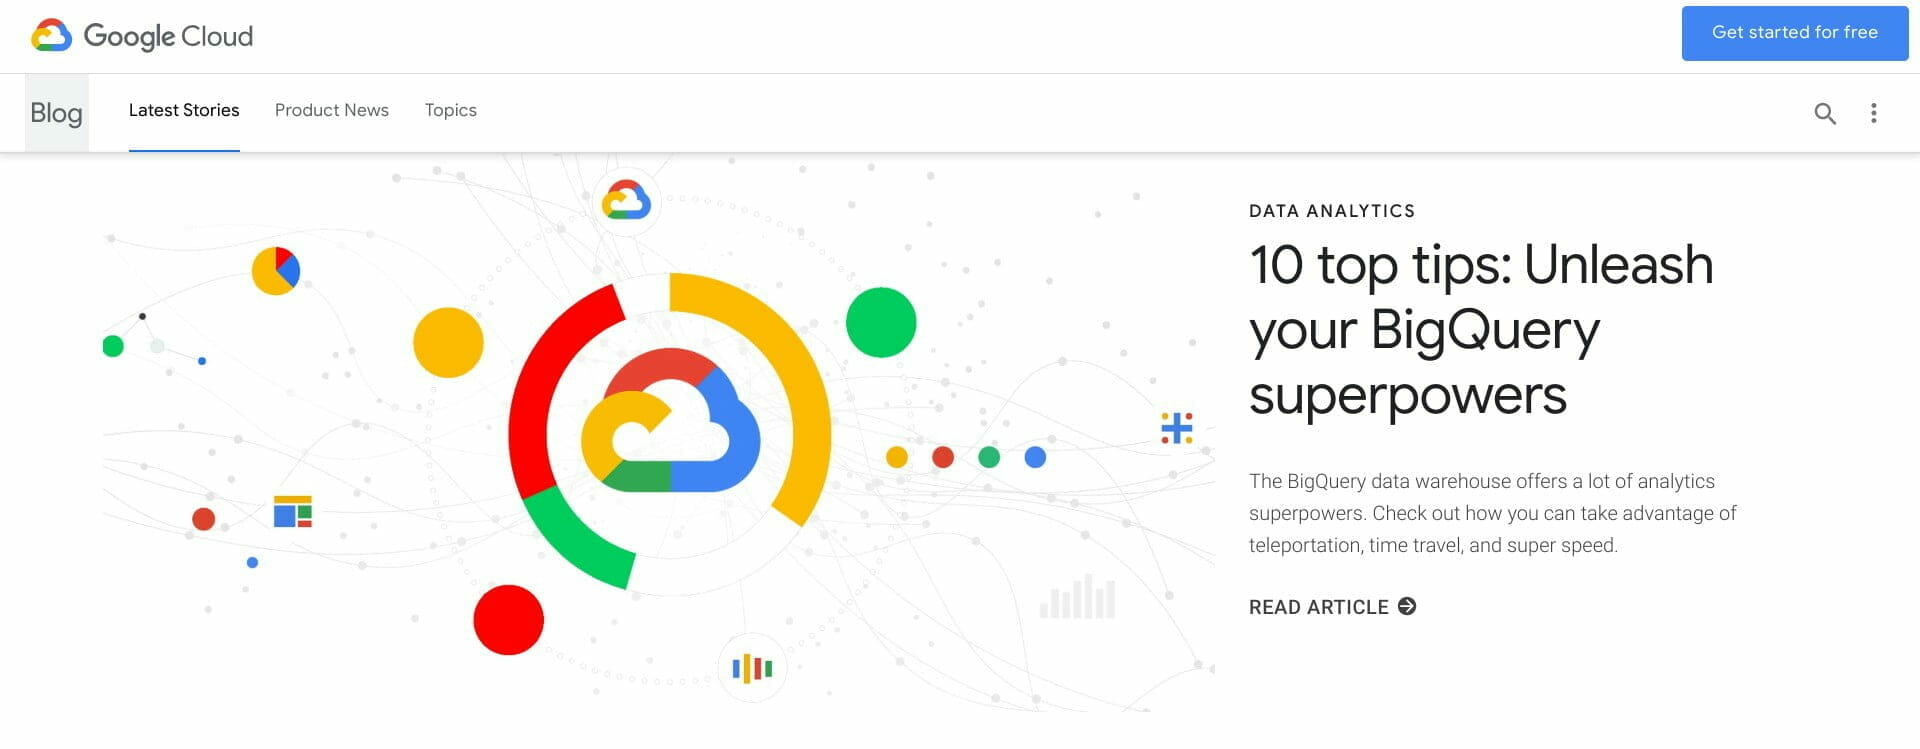 Google Cloud Blog